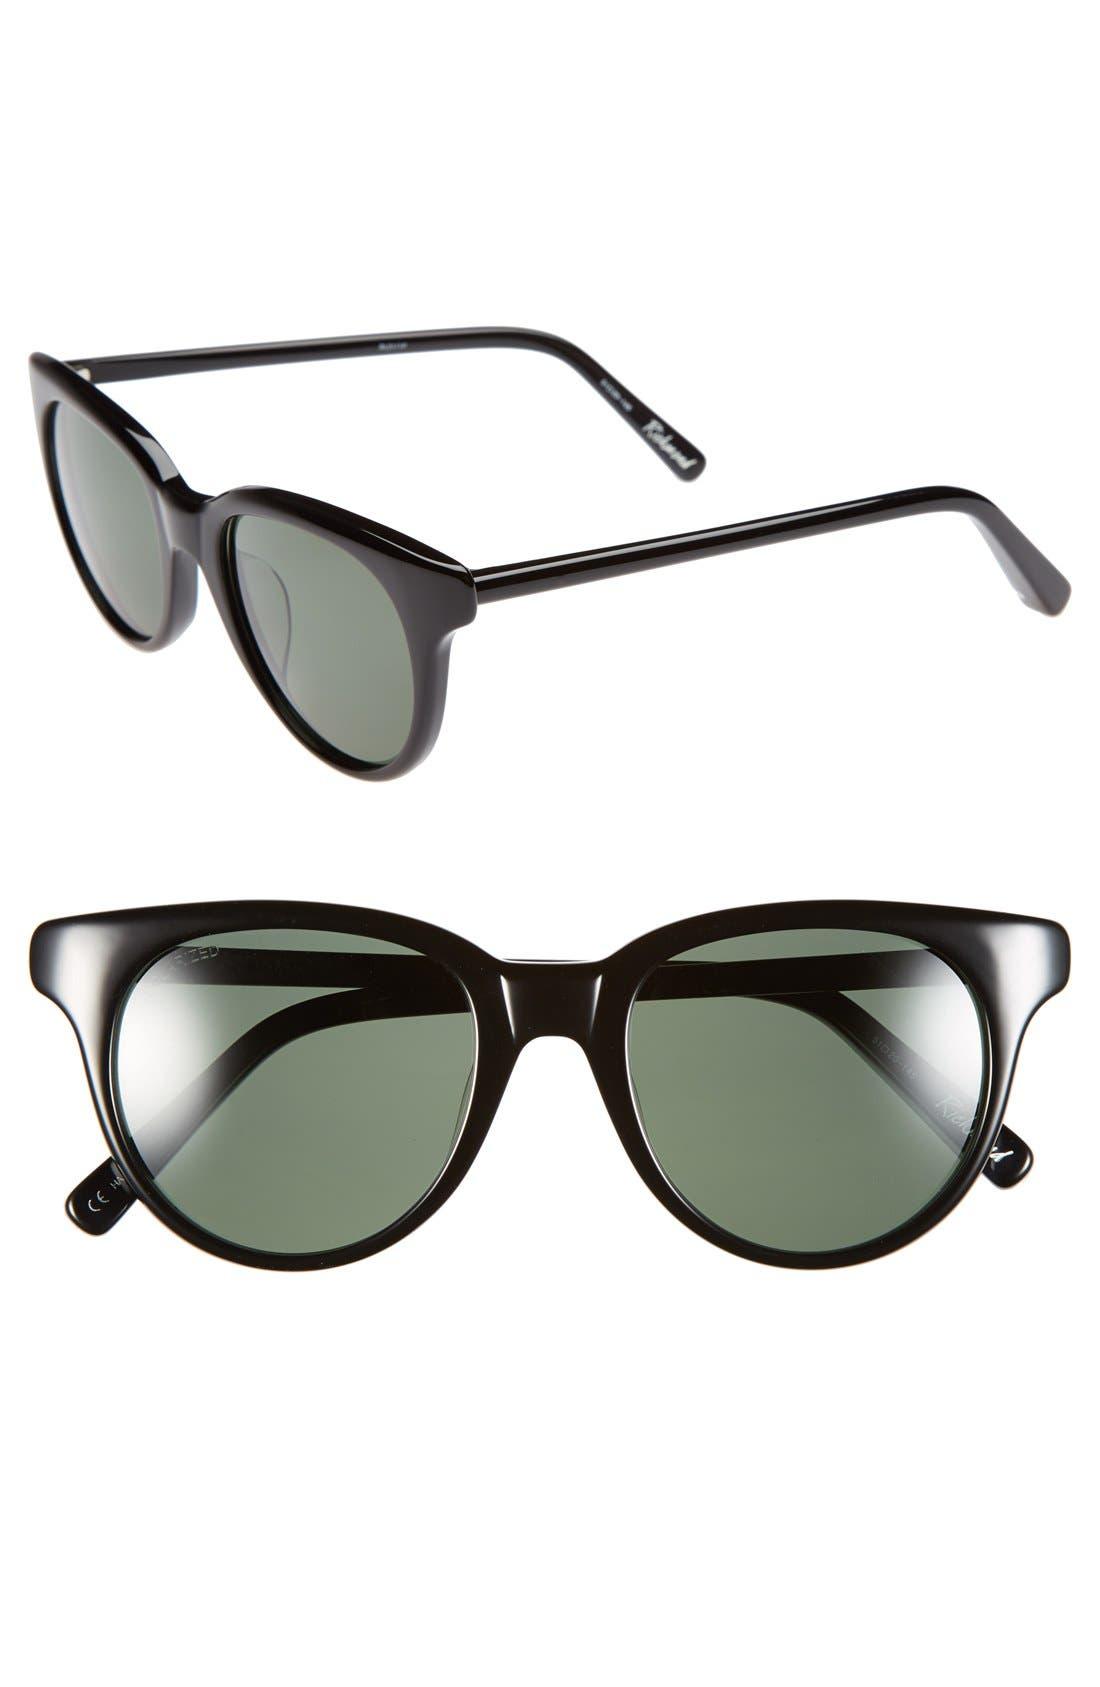 Alternate Image 1 Selected - Elizabeth and James 'Richmond' 51mm Polarized Sunglasses